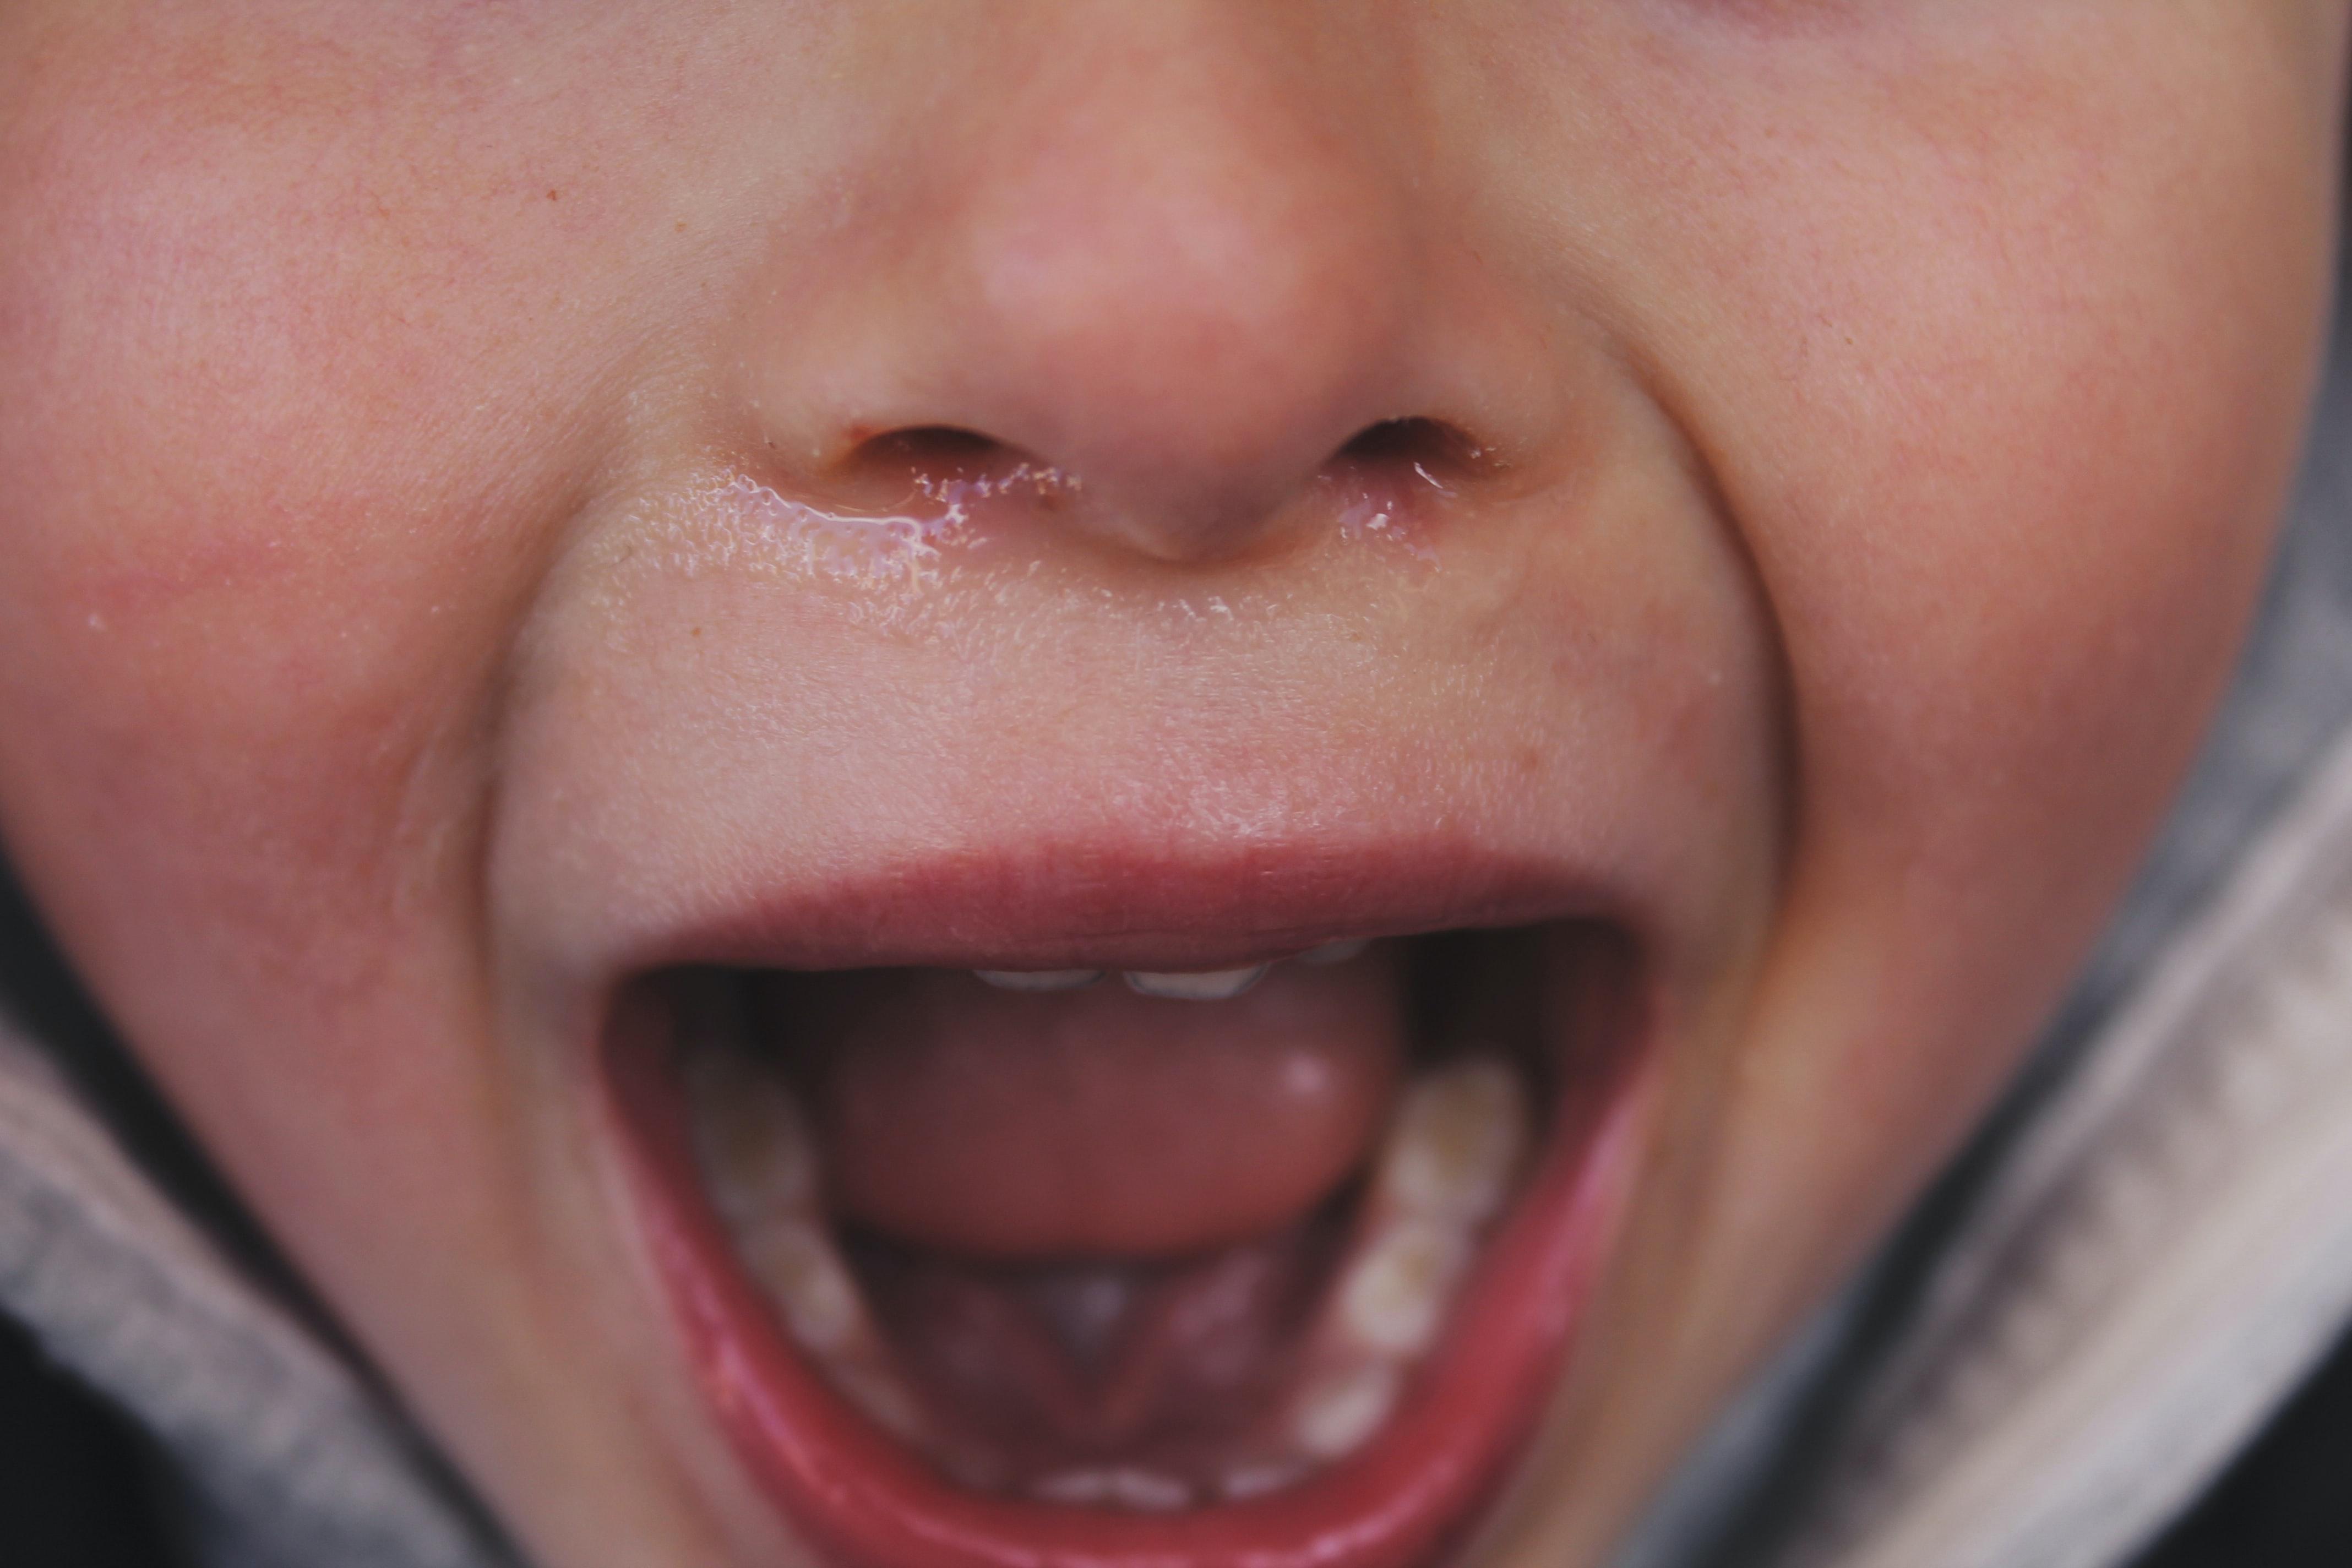 Child screaming